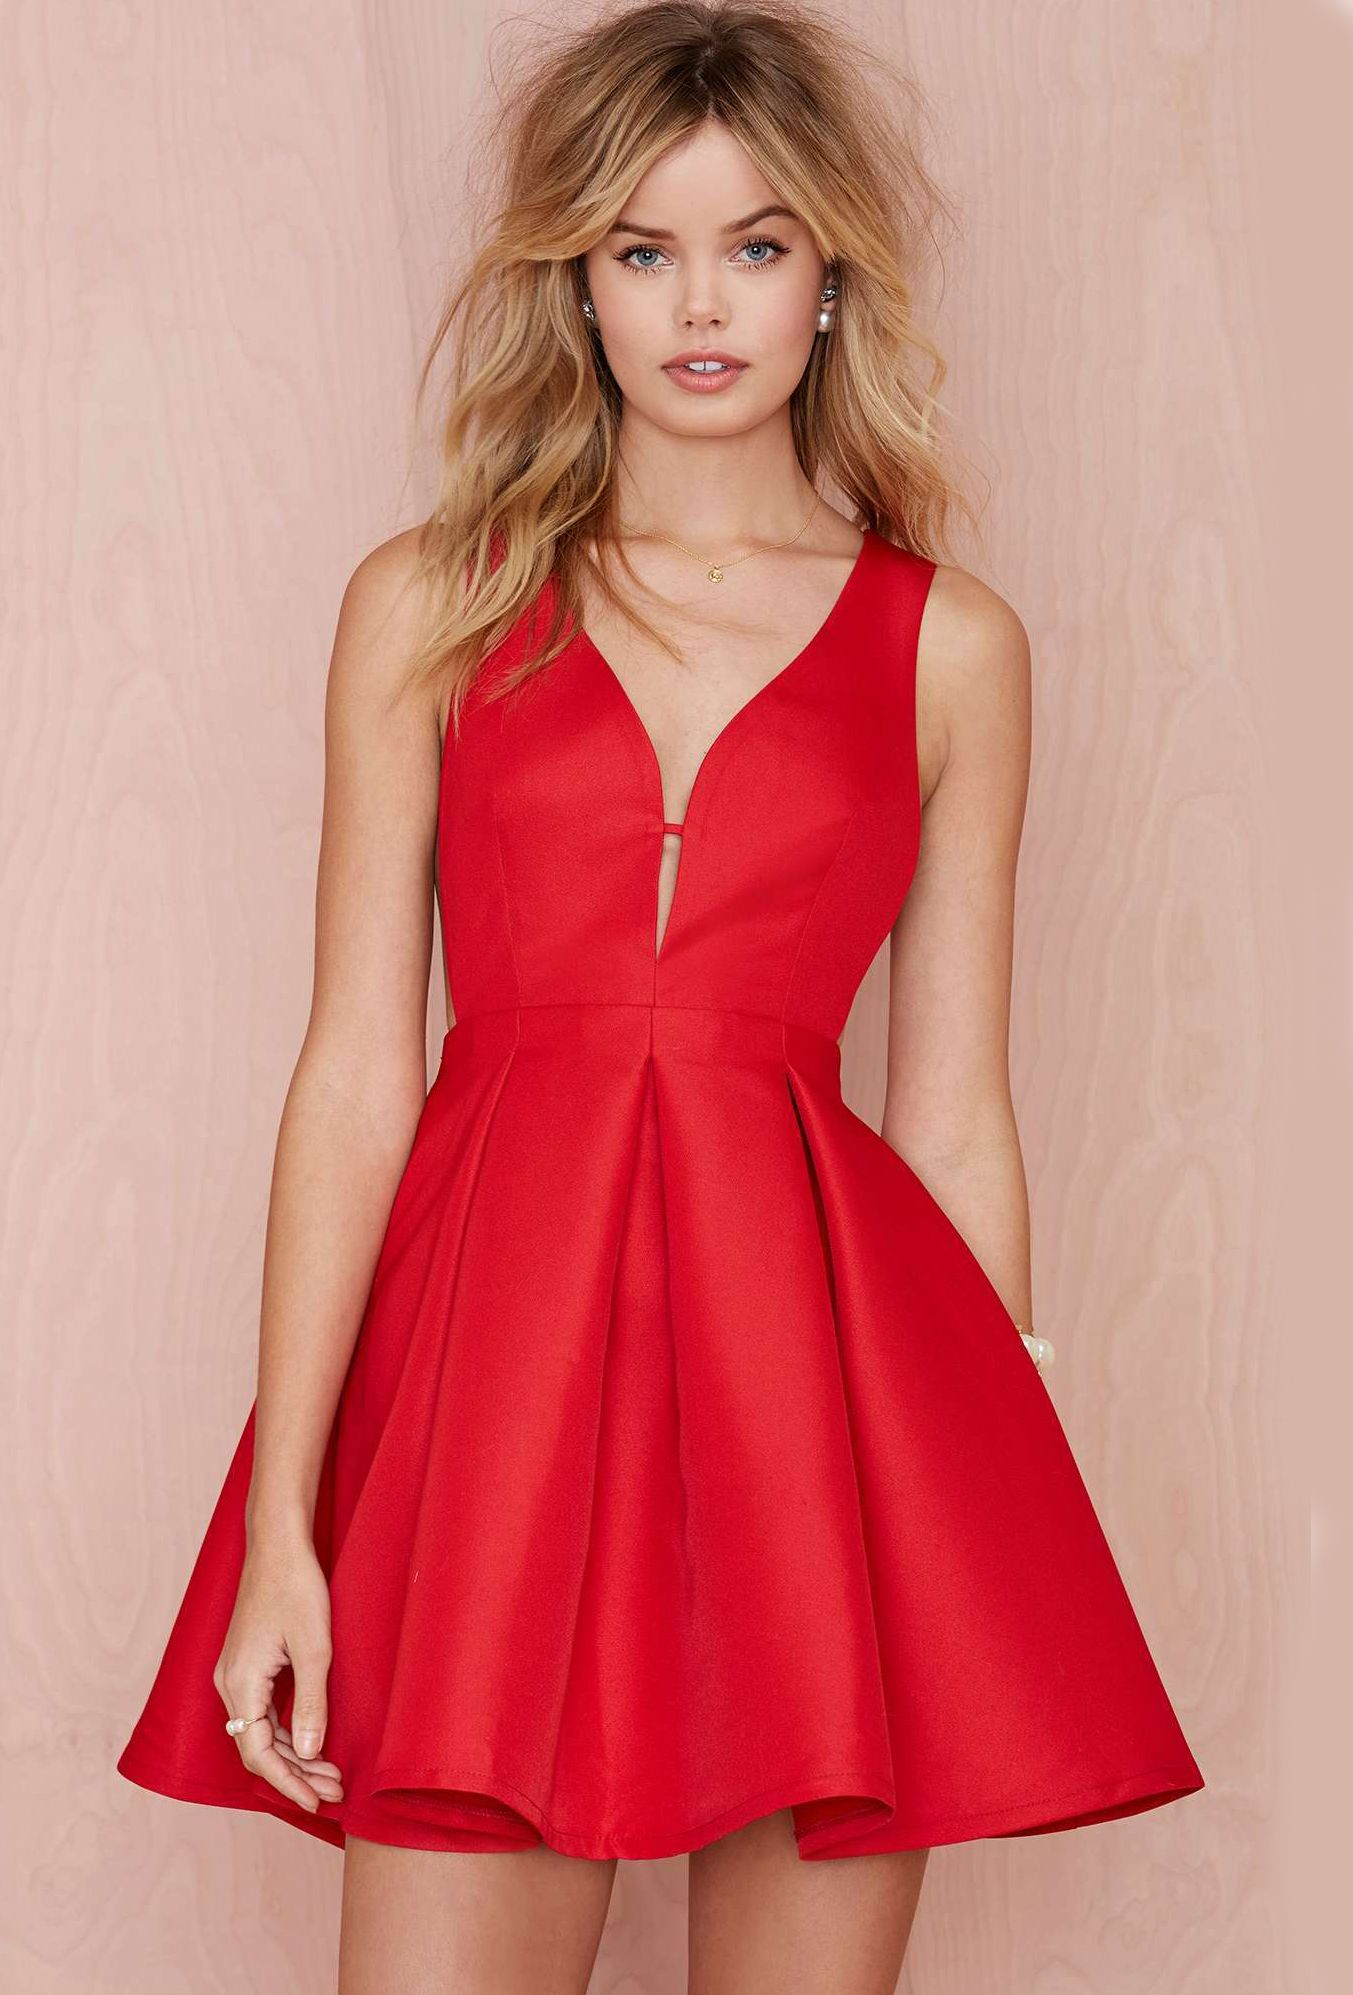 84c02a05d Vestido sin manga-rojo 15.29